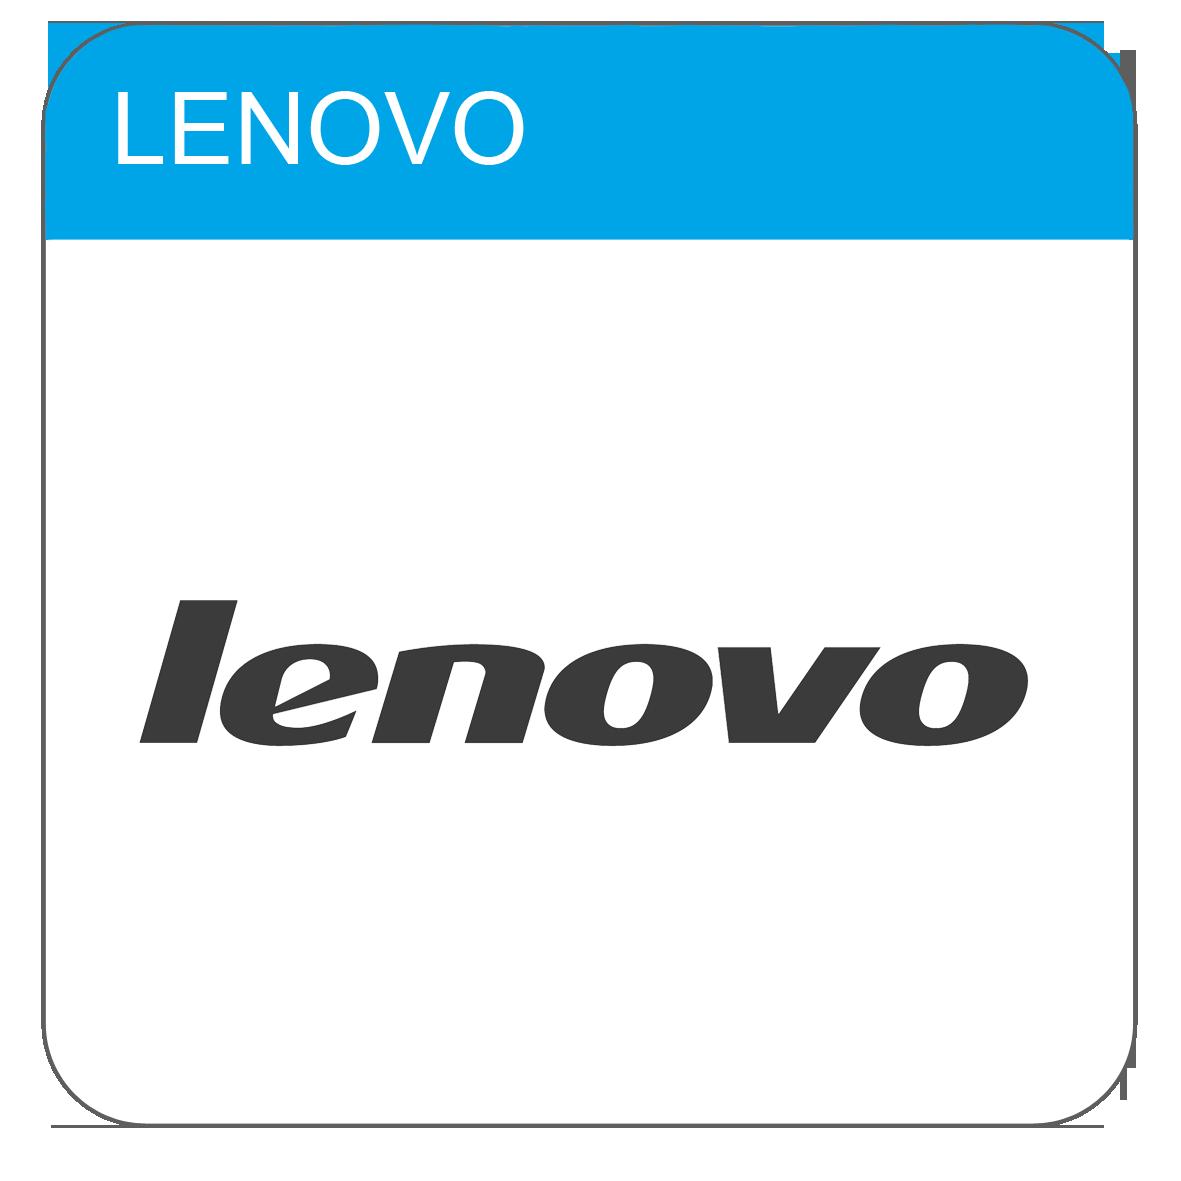 Lenovo Drivers & Handleidingen